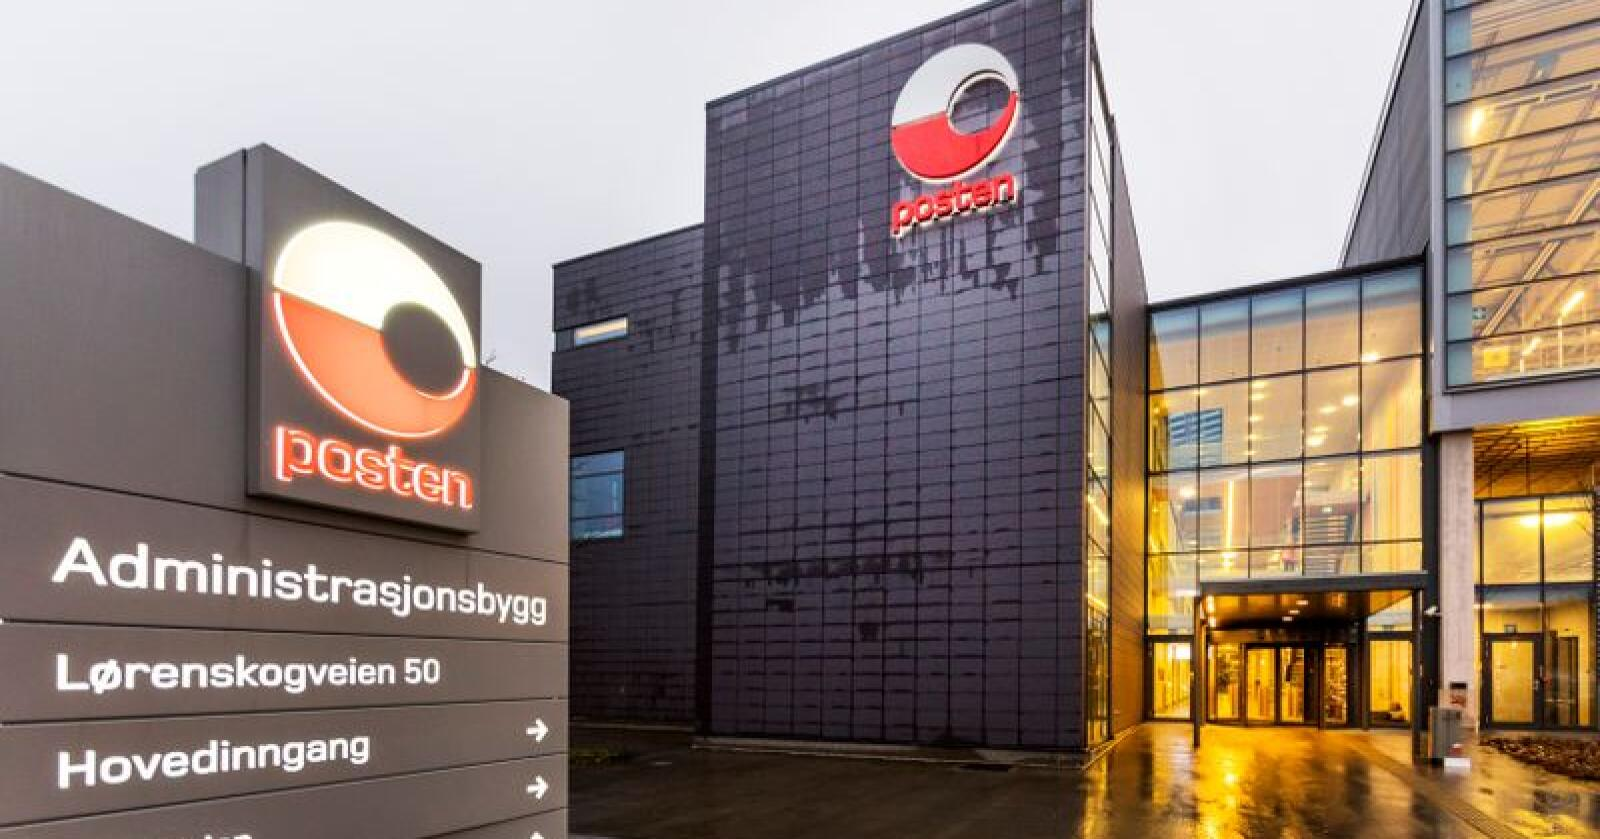 Posten Norge øker omsetningen i tredje kvartal. Foto: Gorm Kallestad / NTB scanpix